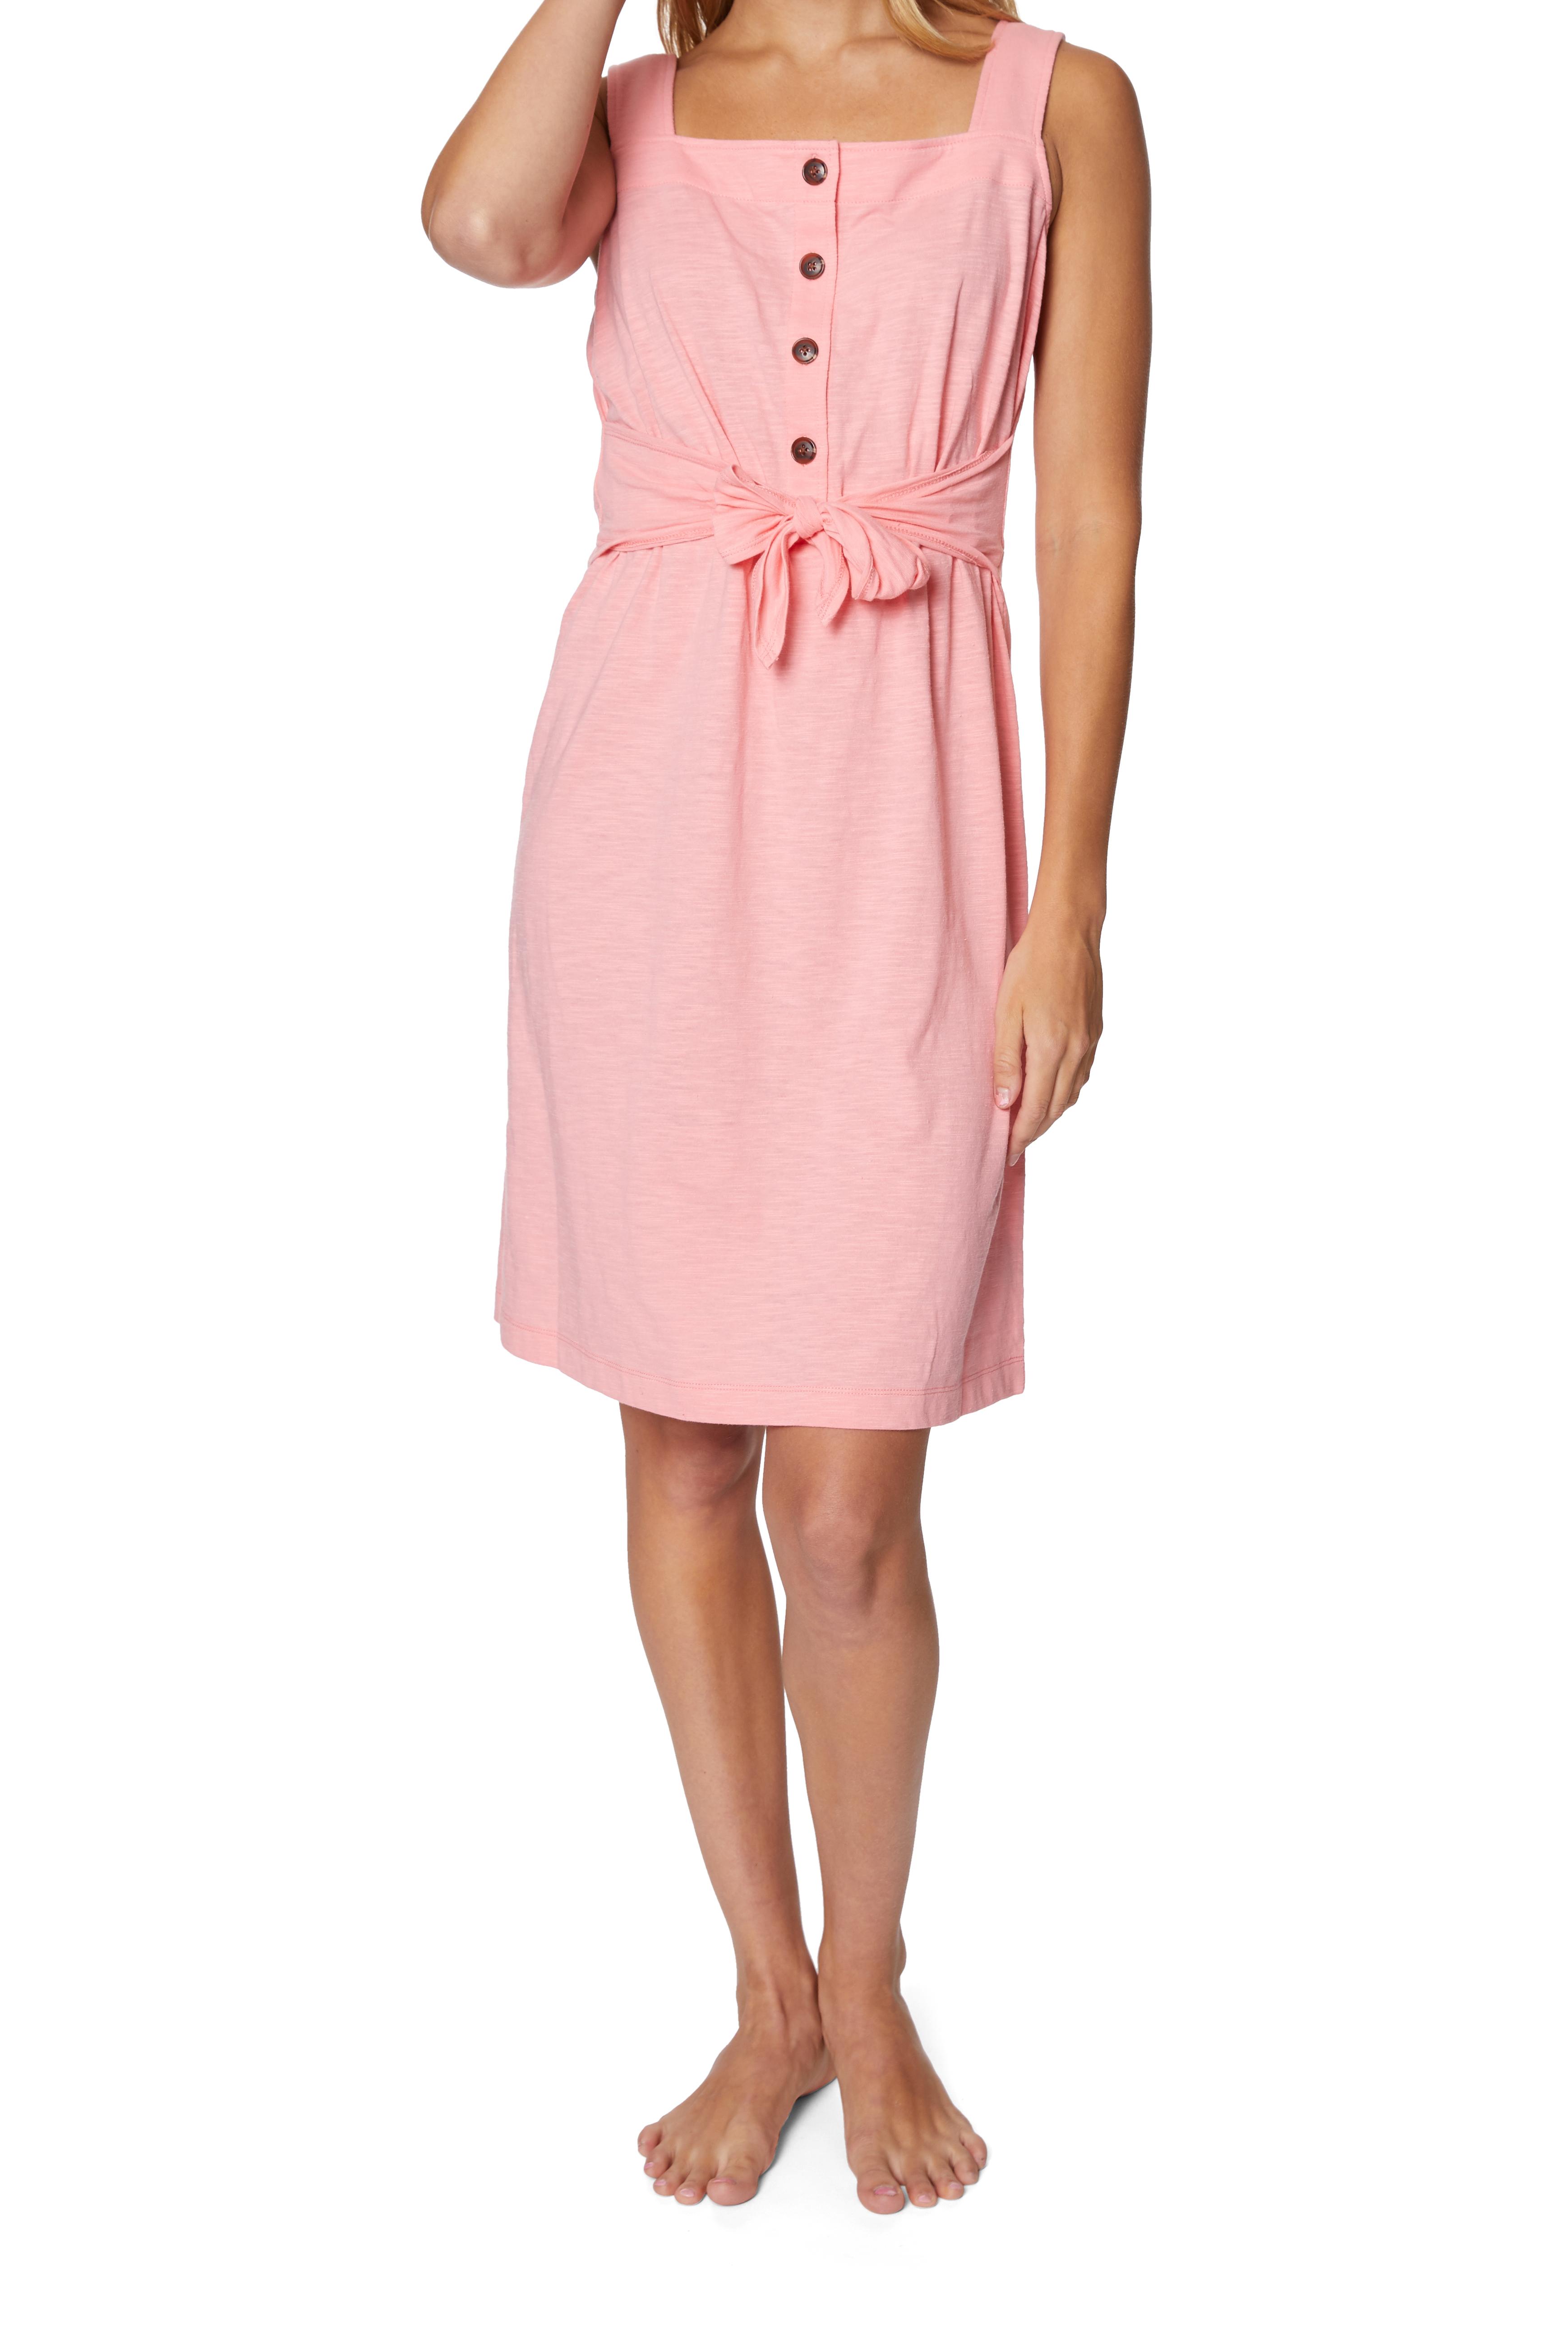 Caribbean Joe® Front Knot Button-Up Dress -Pink - Front